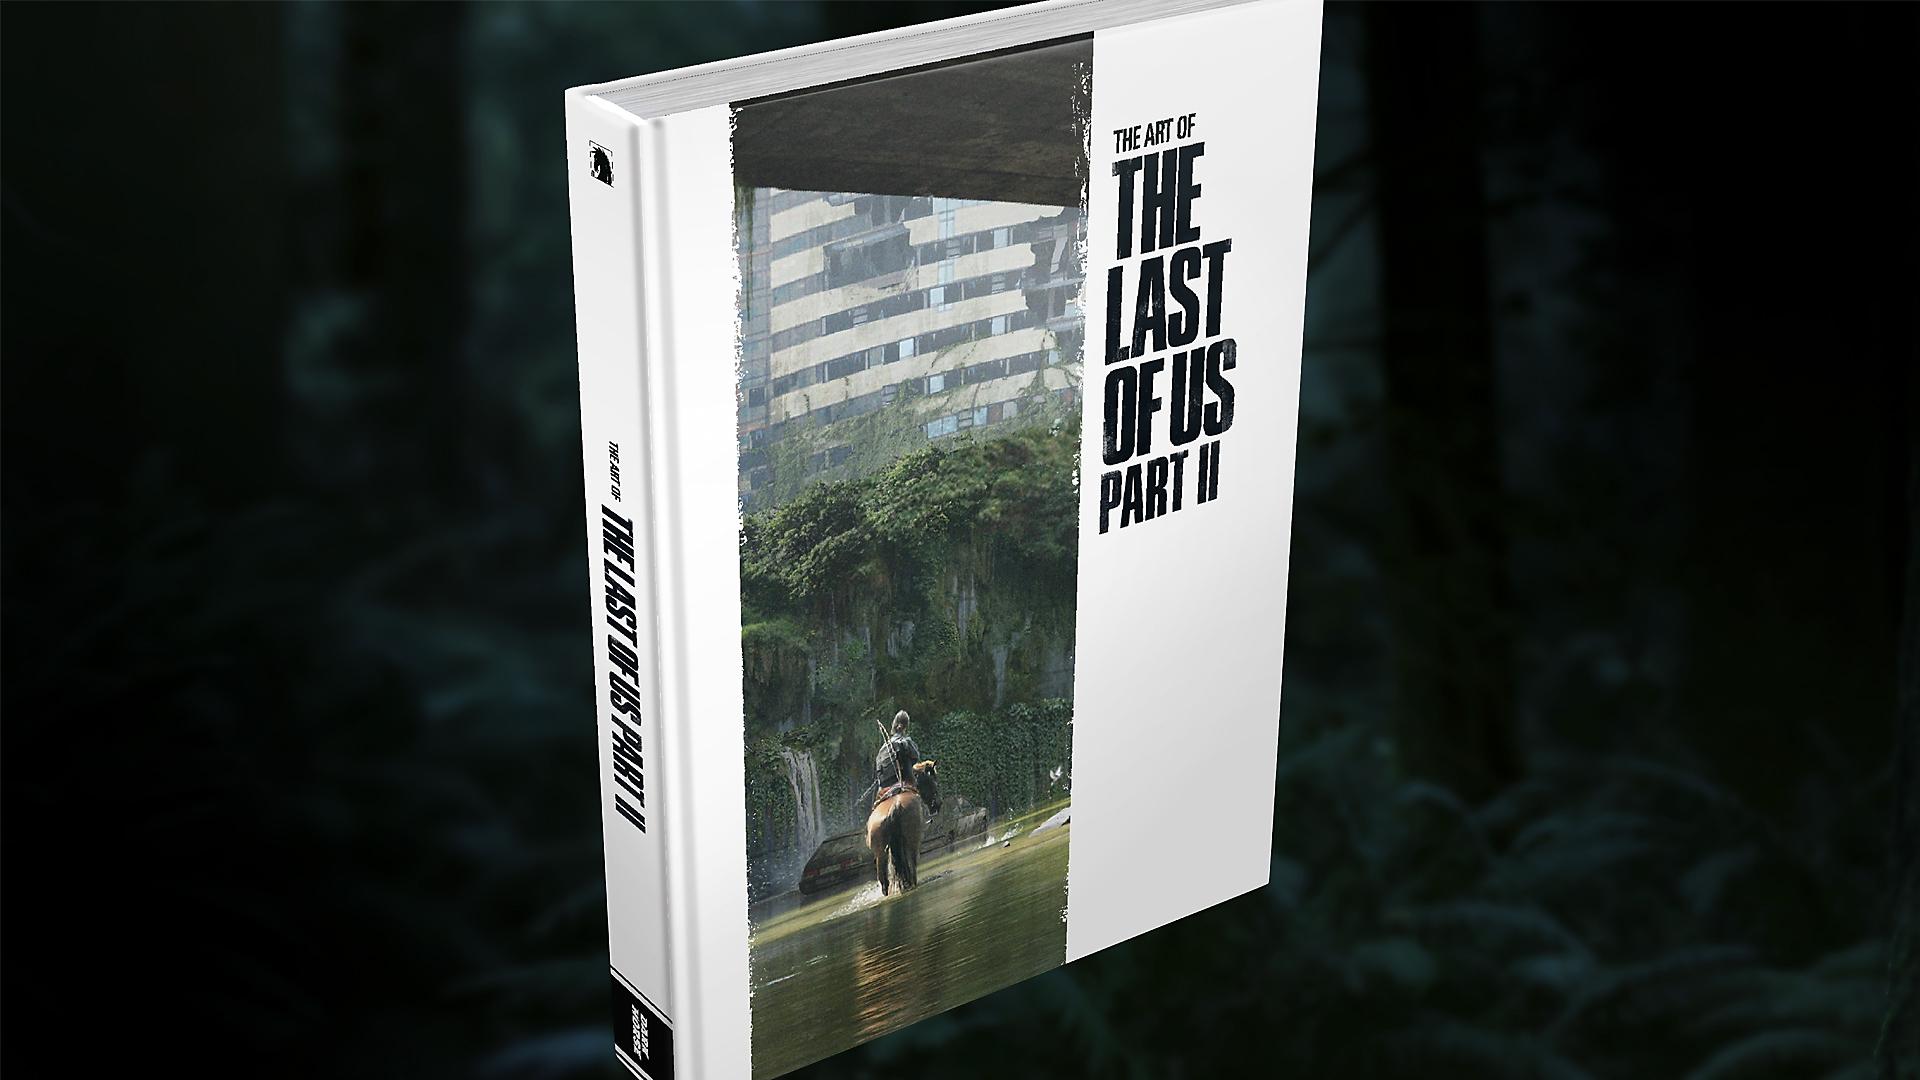 The last of us part ii art book